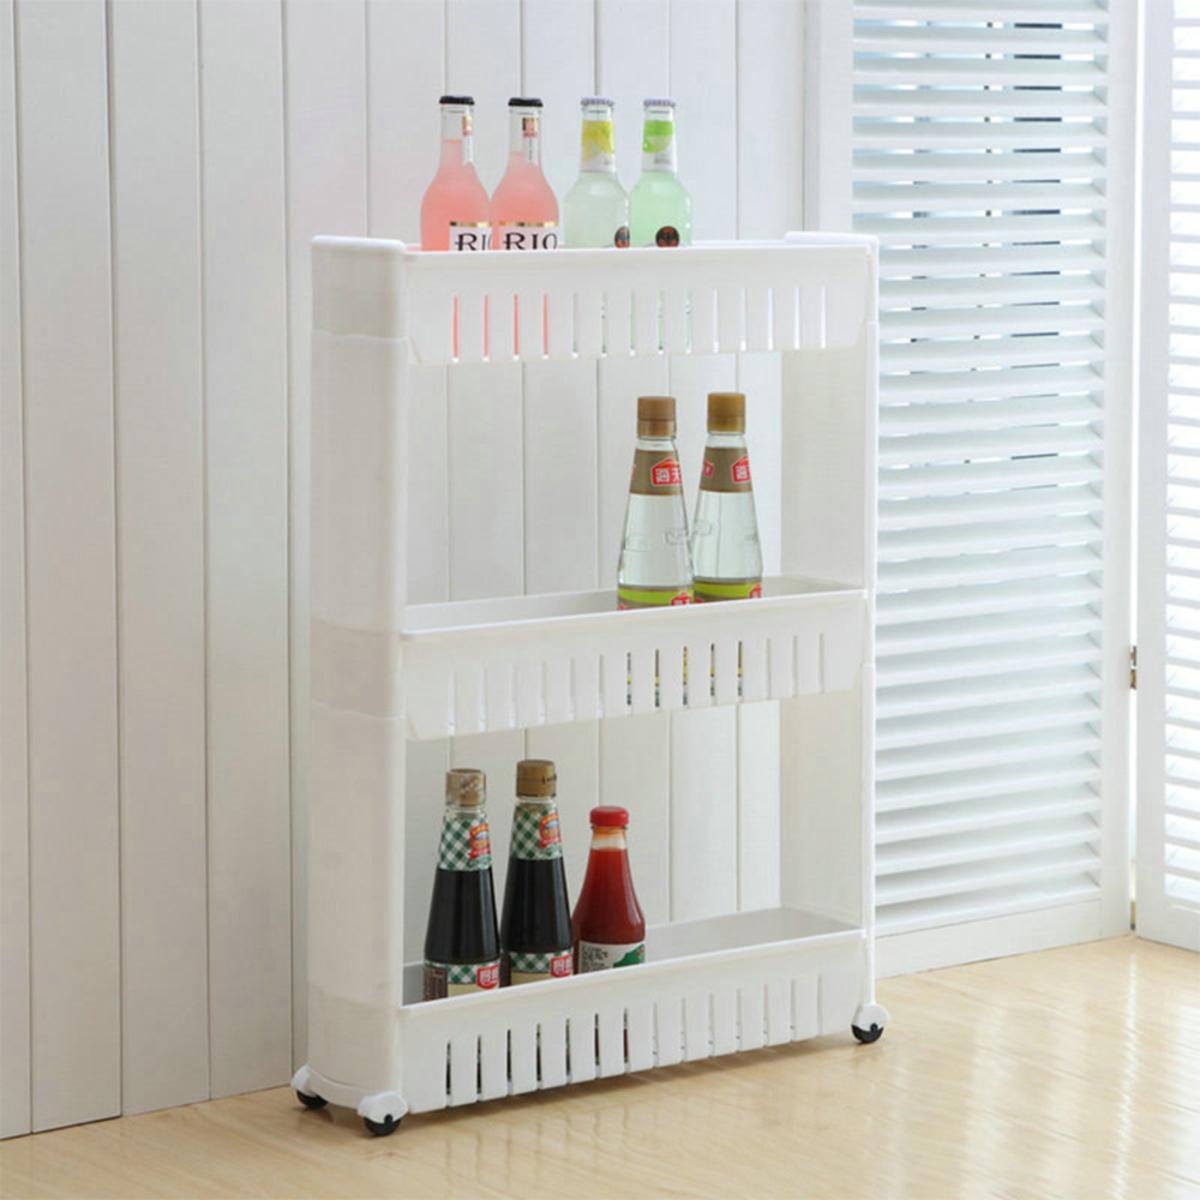 3 Tiers narrow organizer rack - HG137203WH (White)